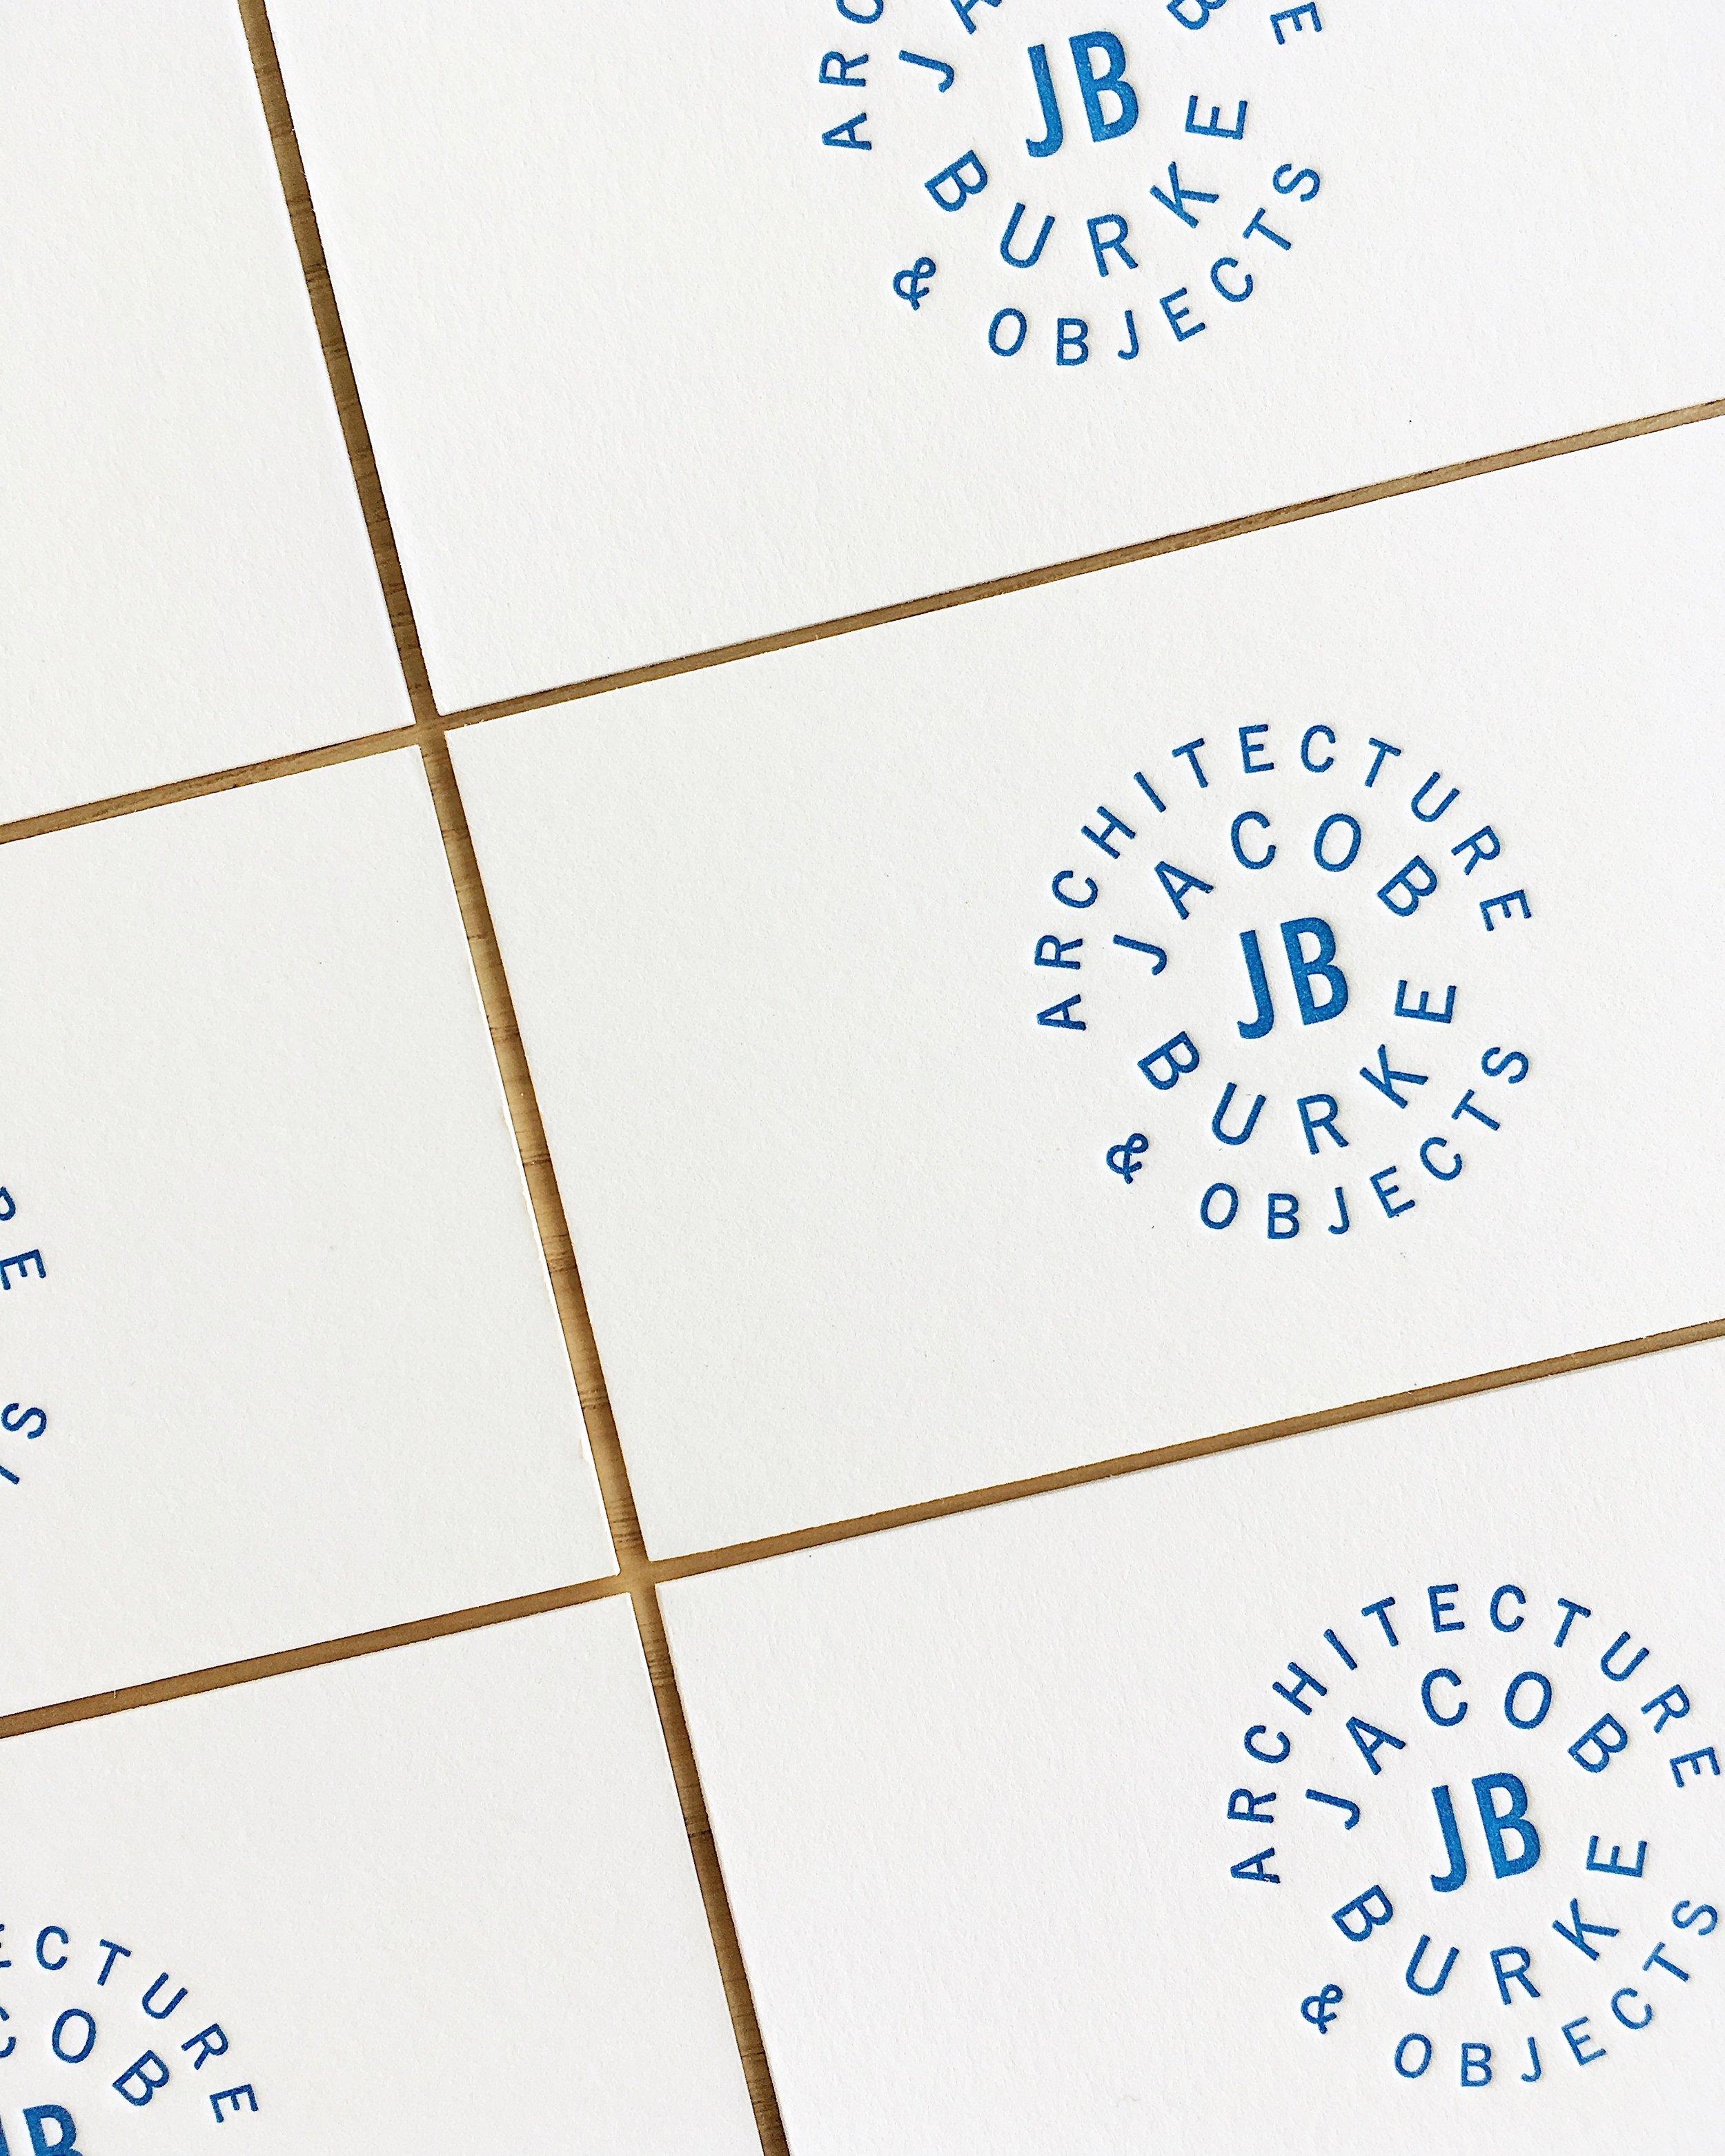 Design & Letterpress by Good South / Jacob Burke Logo & Letterpress Business Card